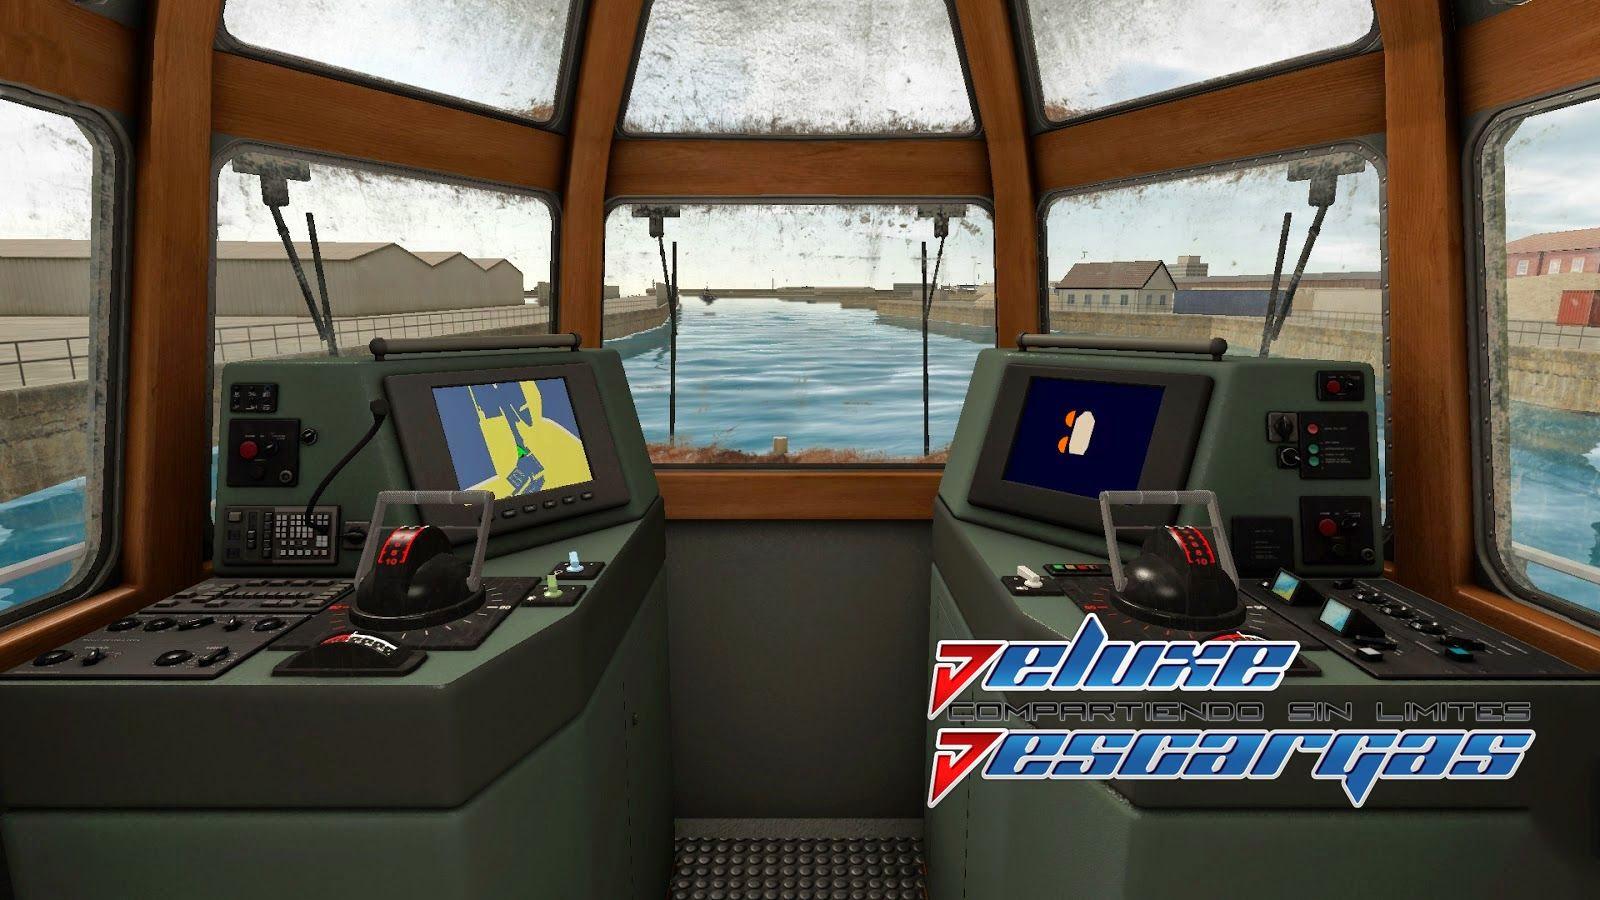 European_Ship_Simulator-www.deluxedescargas.com%2B(6).jpg